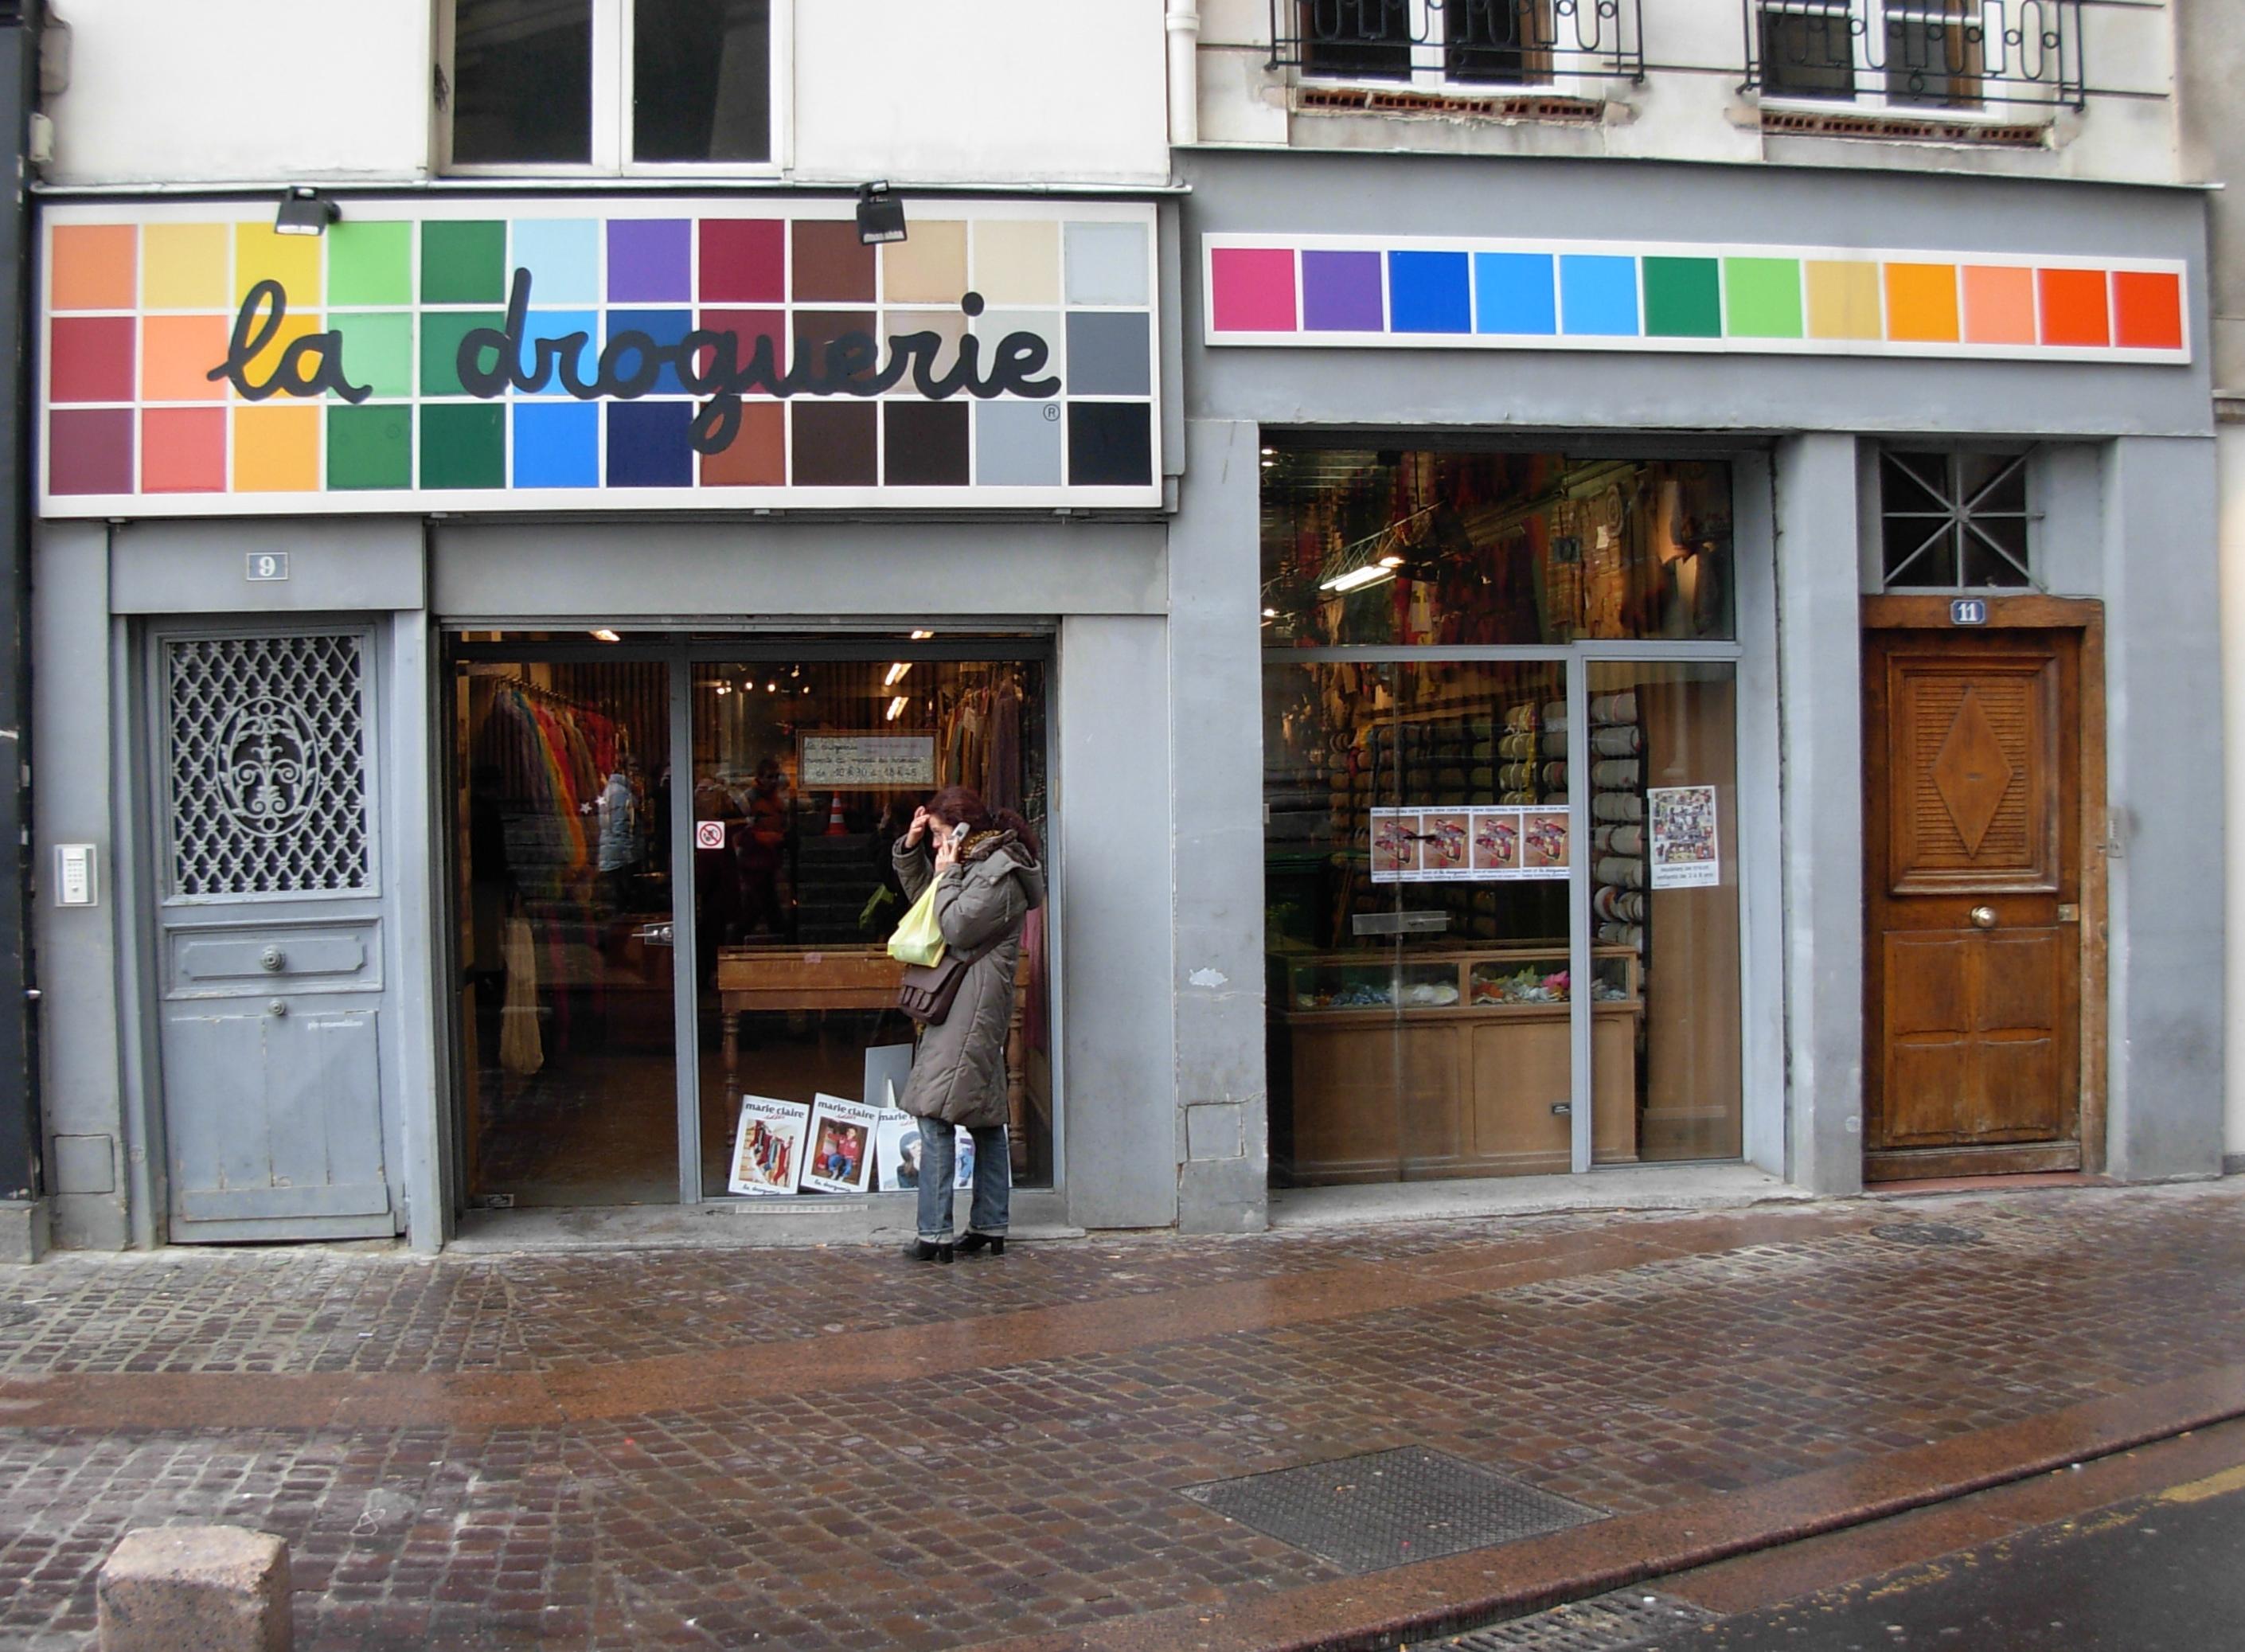 la droguerie knit shop in paris flickr photo sharing. Black Bedroom Furniture Sets. Home Design Ideas